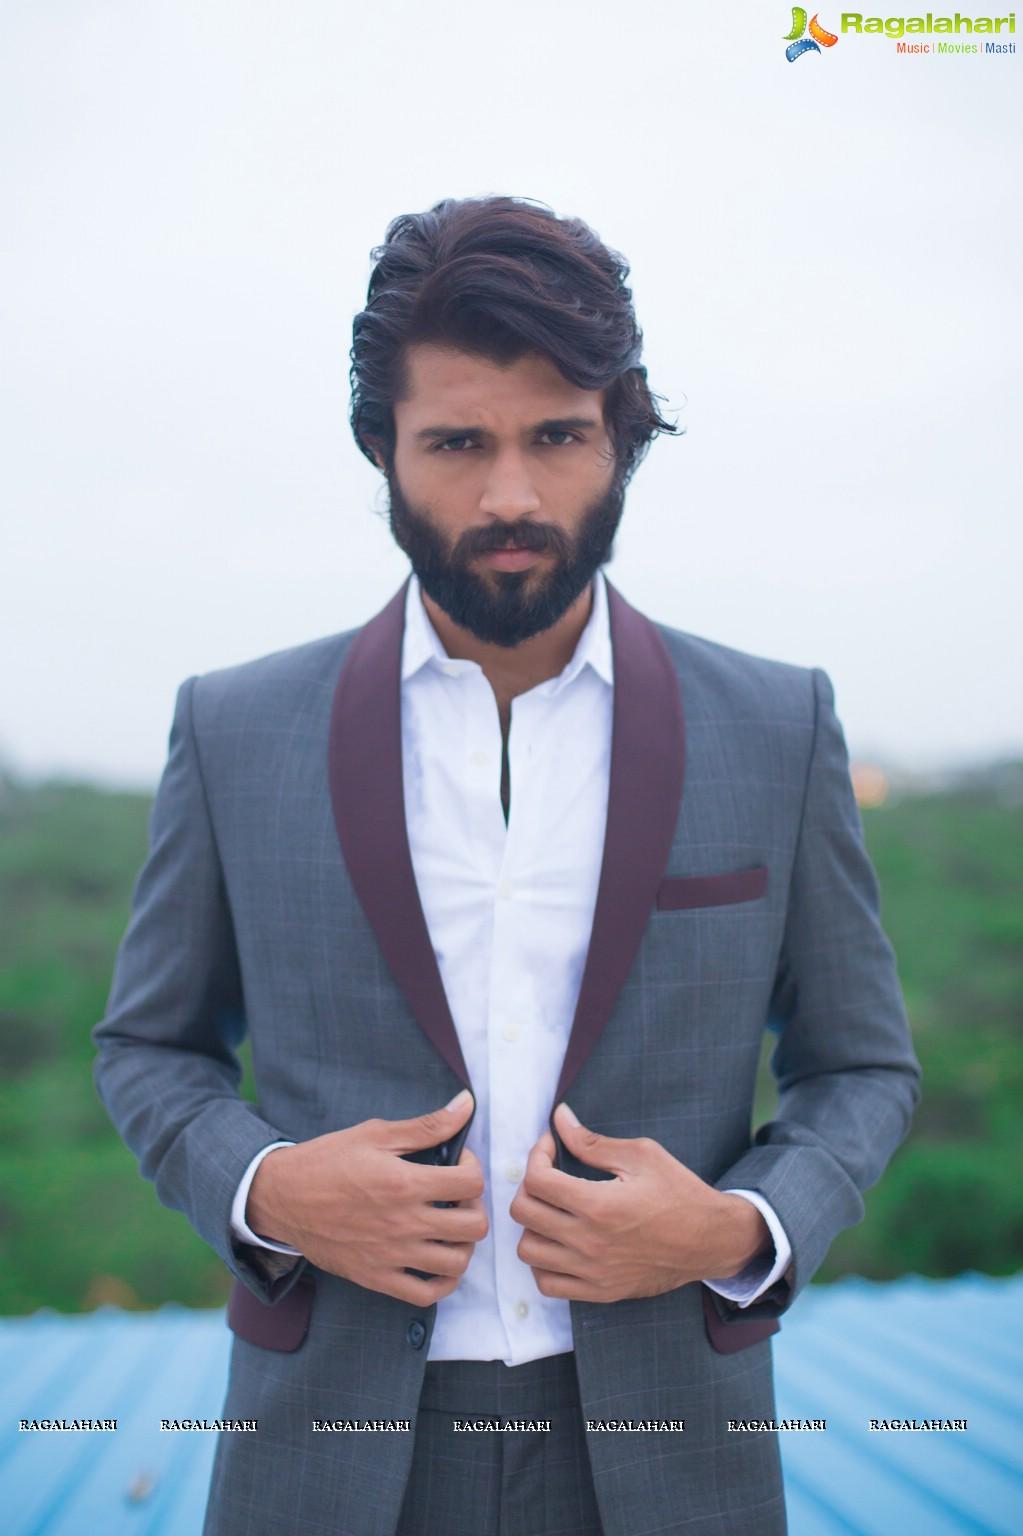 Vijay Devarakonda Image 1 Latest Tollywood Actor Photos Images